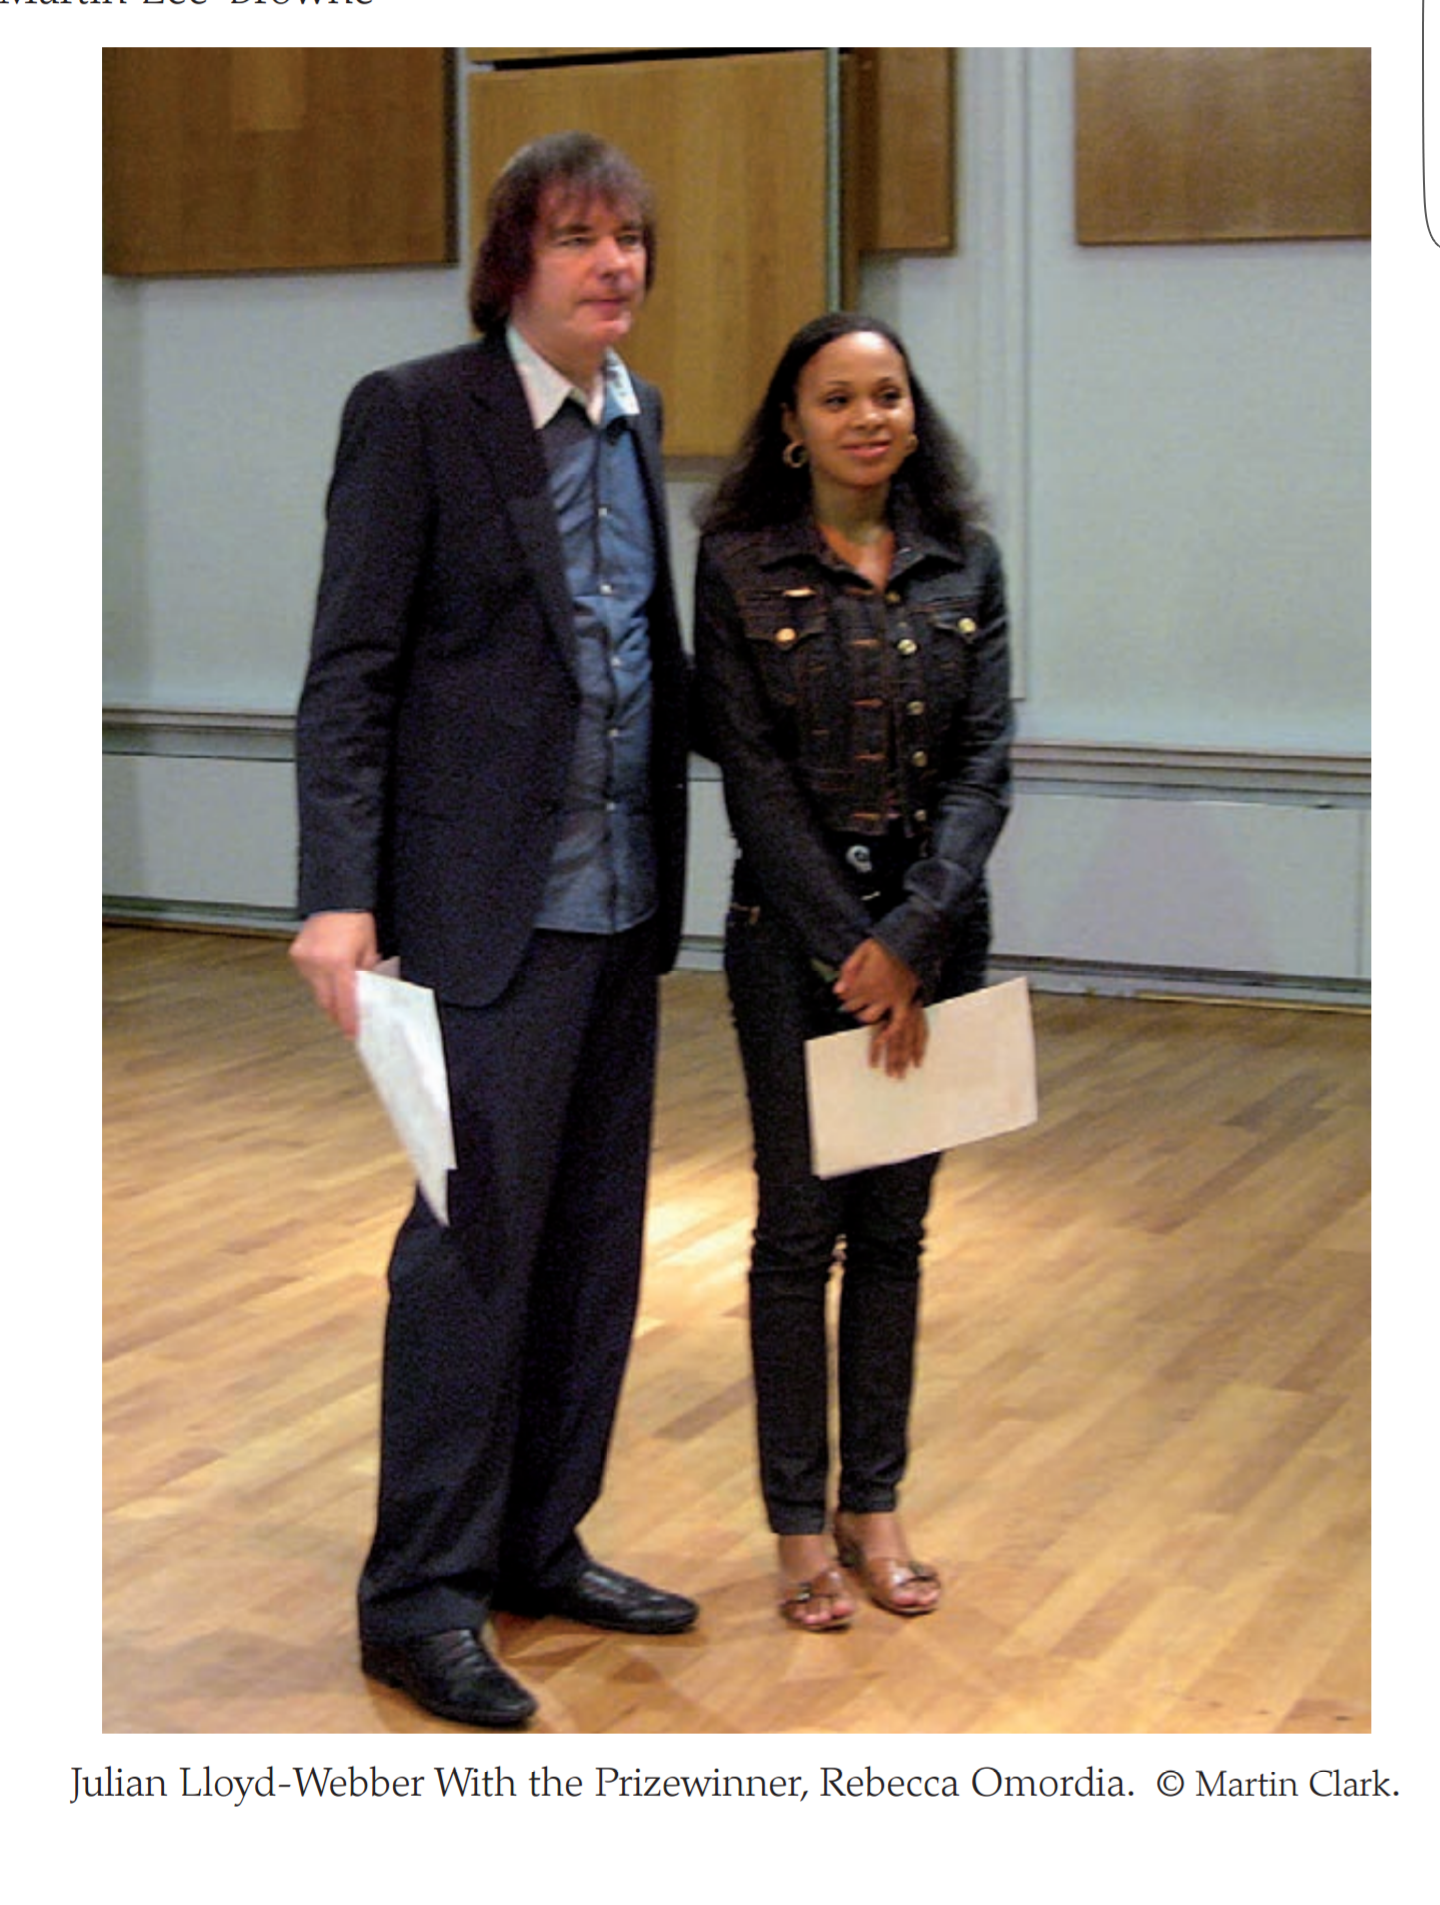 Julian Lloyd Webber and Rebeca Omordia - Delius Prize at Birmingham Conservatoire, 2009